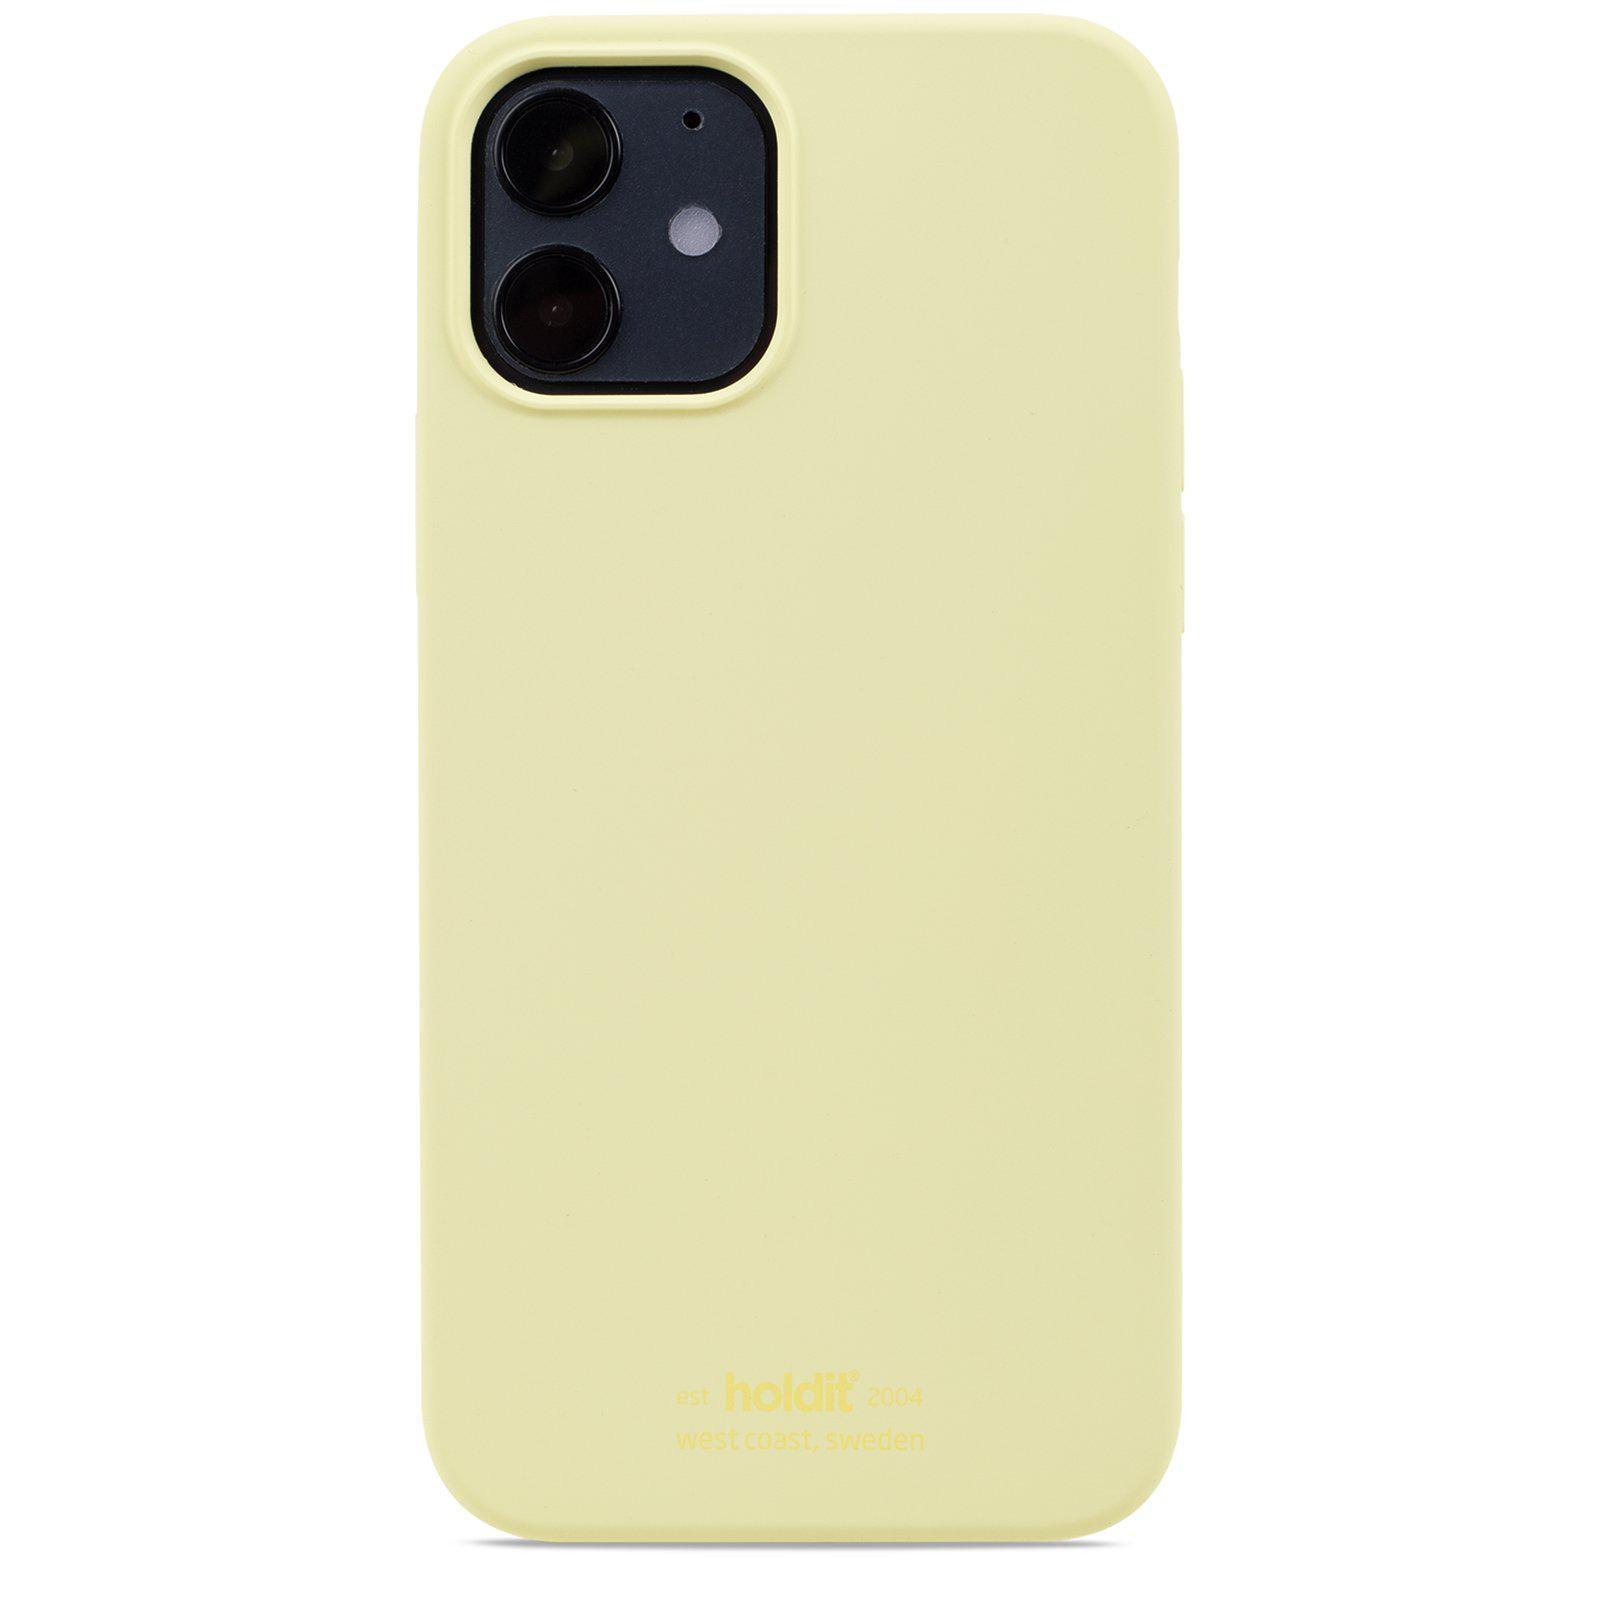 Silikonskal iPhone 12/12 Pro Lemonade